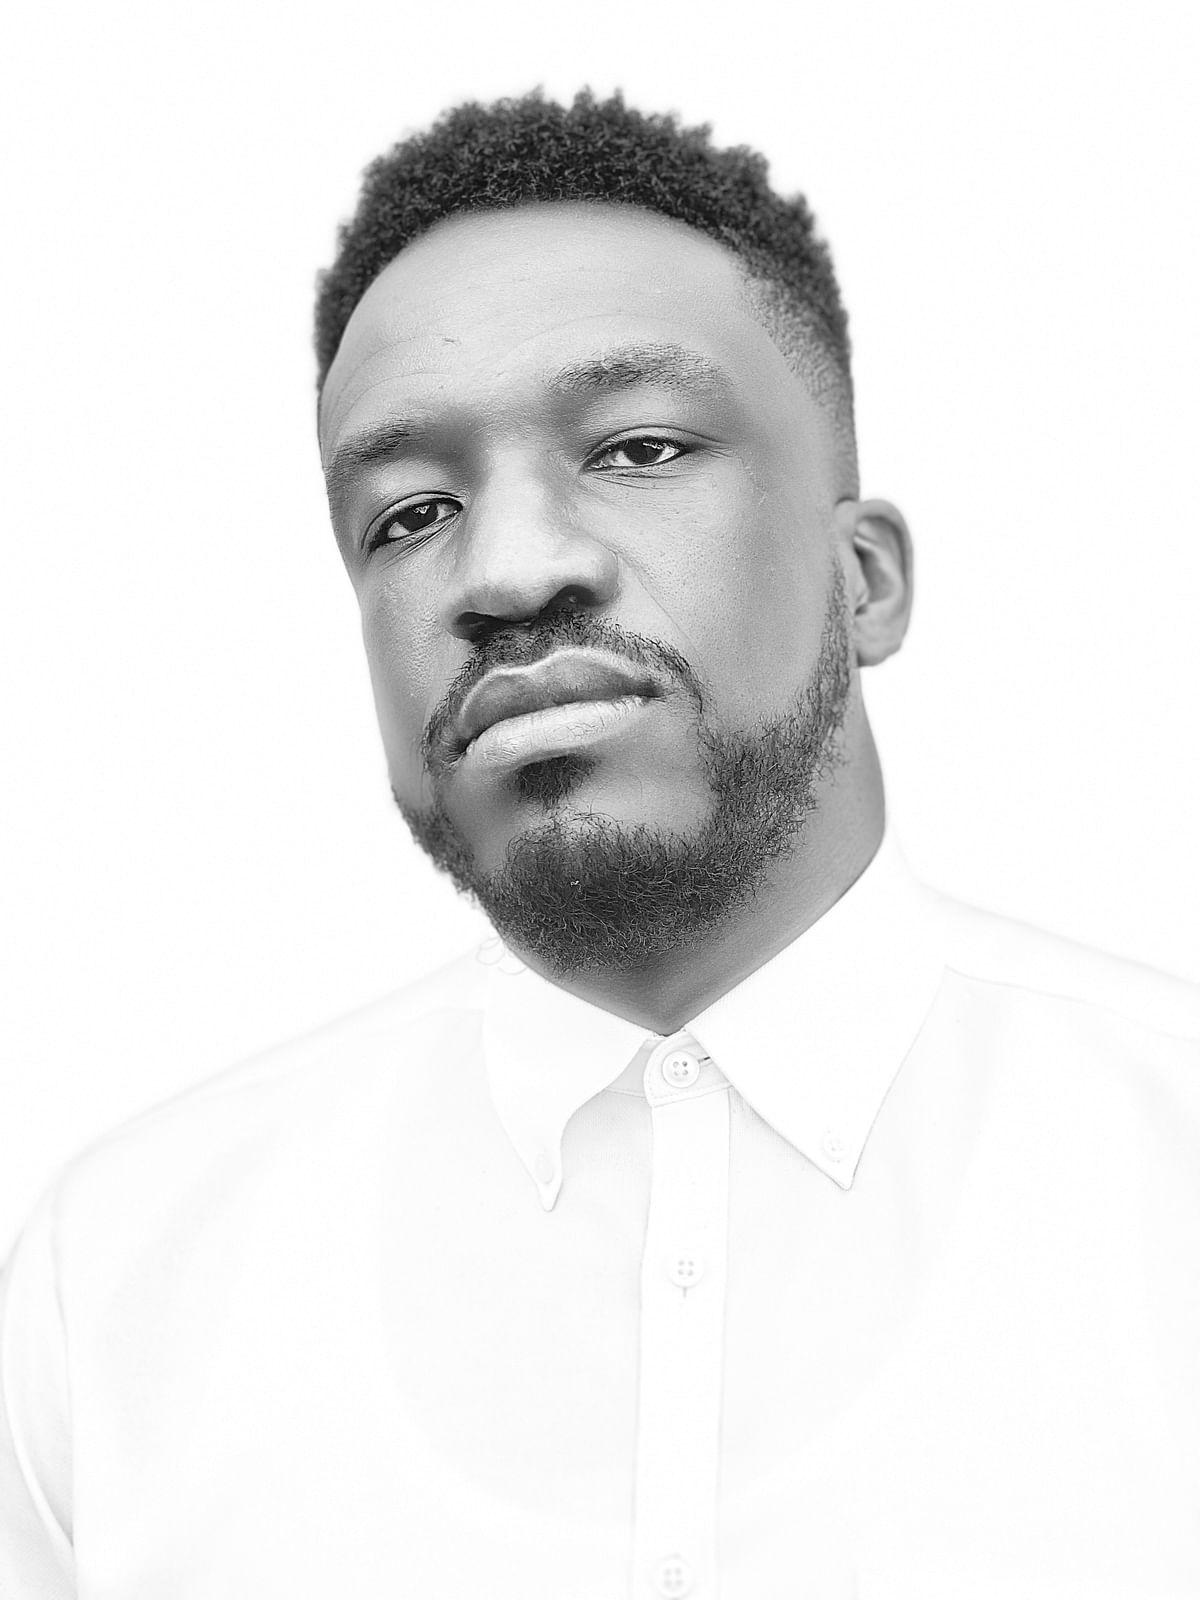 Isaac Kwame Adom